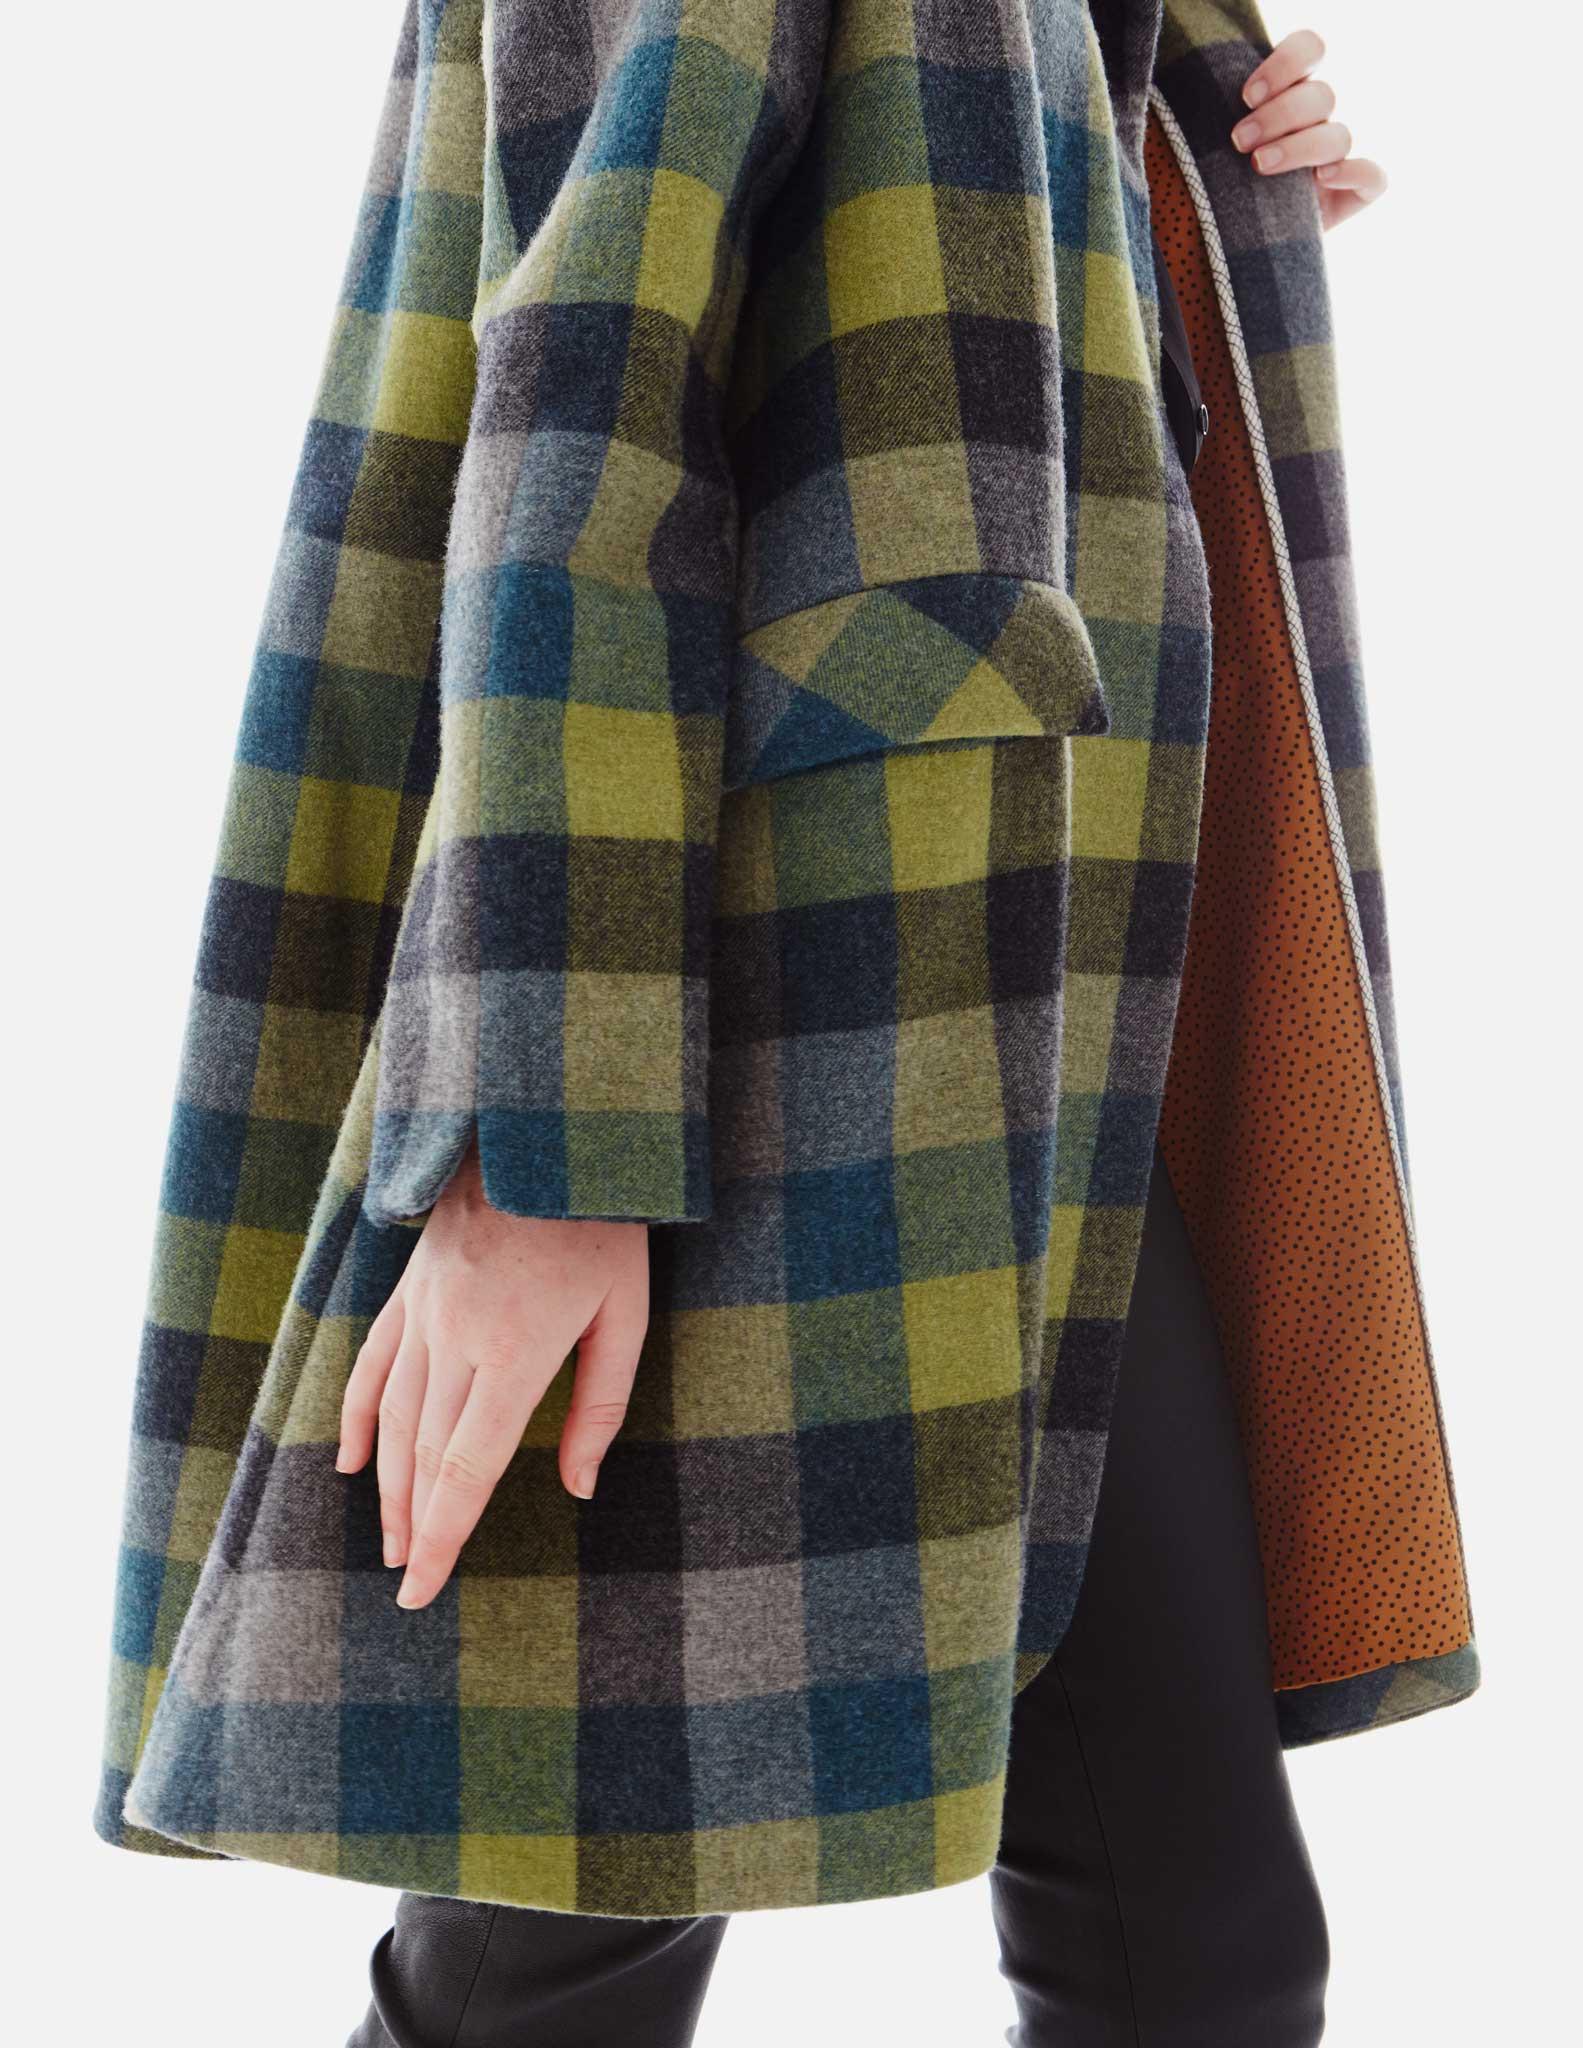 novisnyc | The Kandinsky Coat